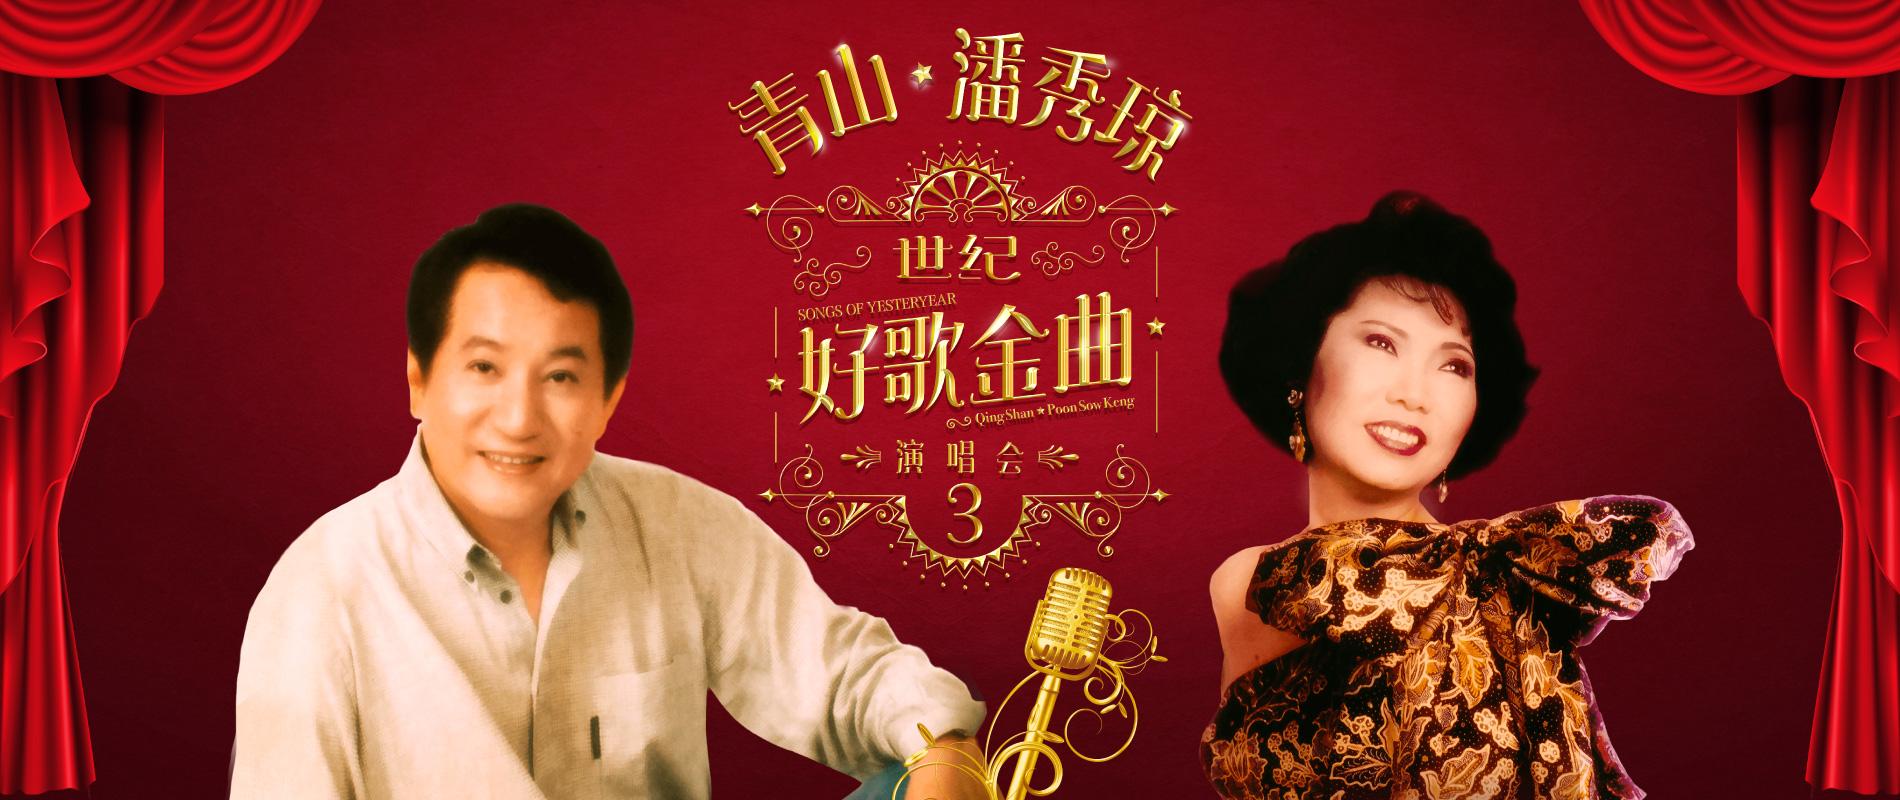 Songs of Yesteryear Part 3 - Qing Shan & Poon Sow Keng